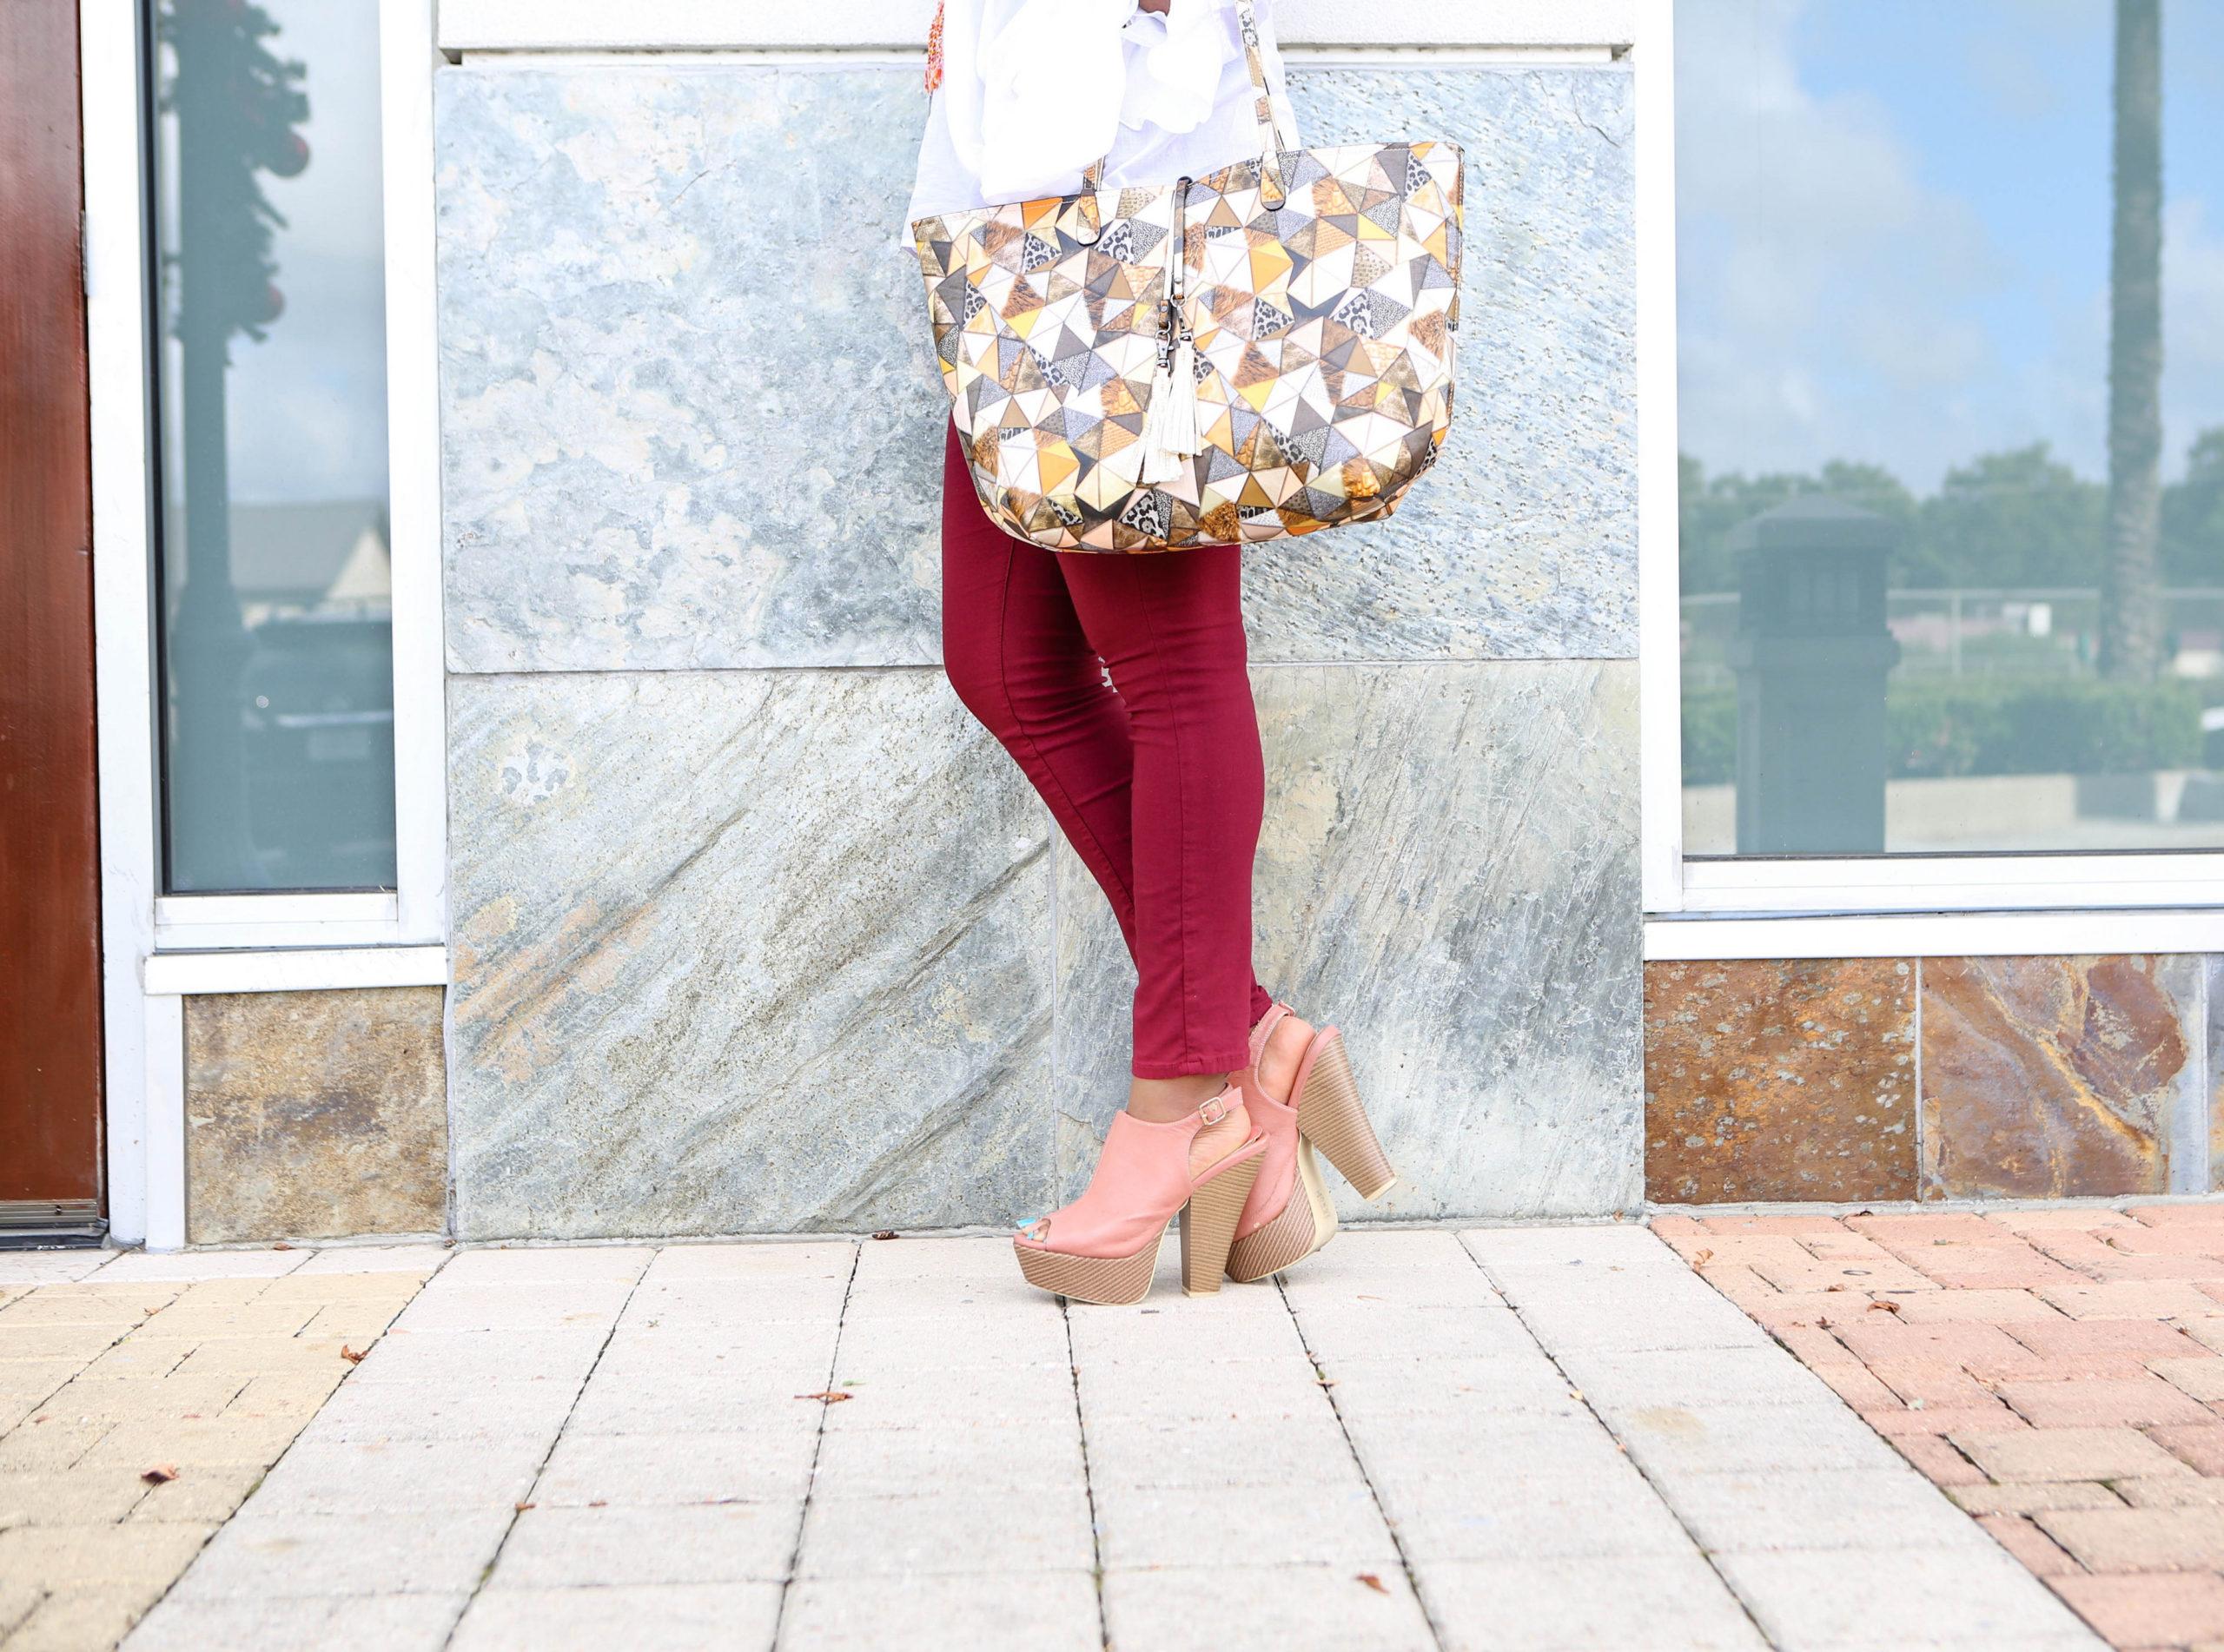 Chigi's World Coral and Cobblestone Patrizia Luca Handbag Shoedazzle Shoes